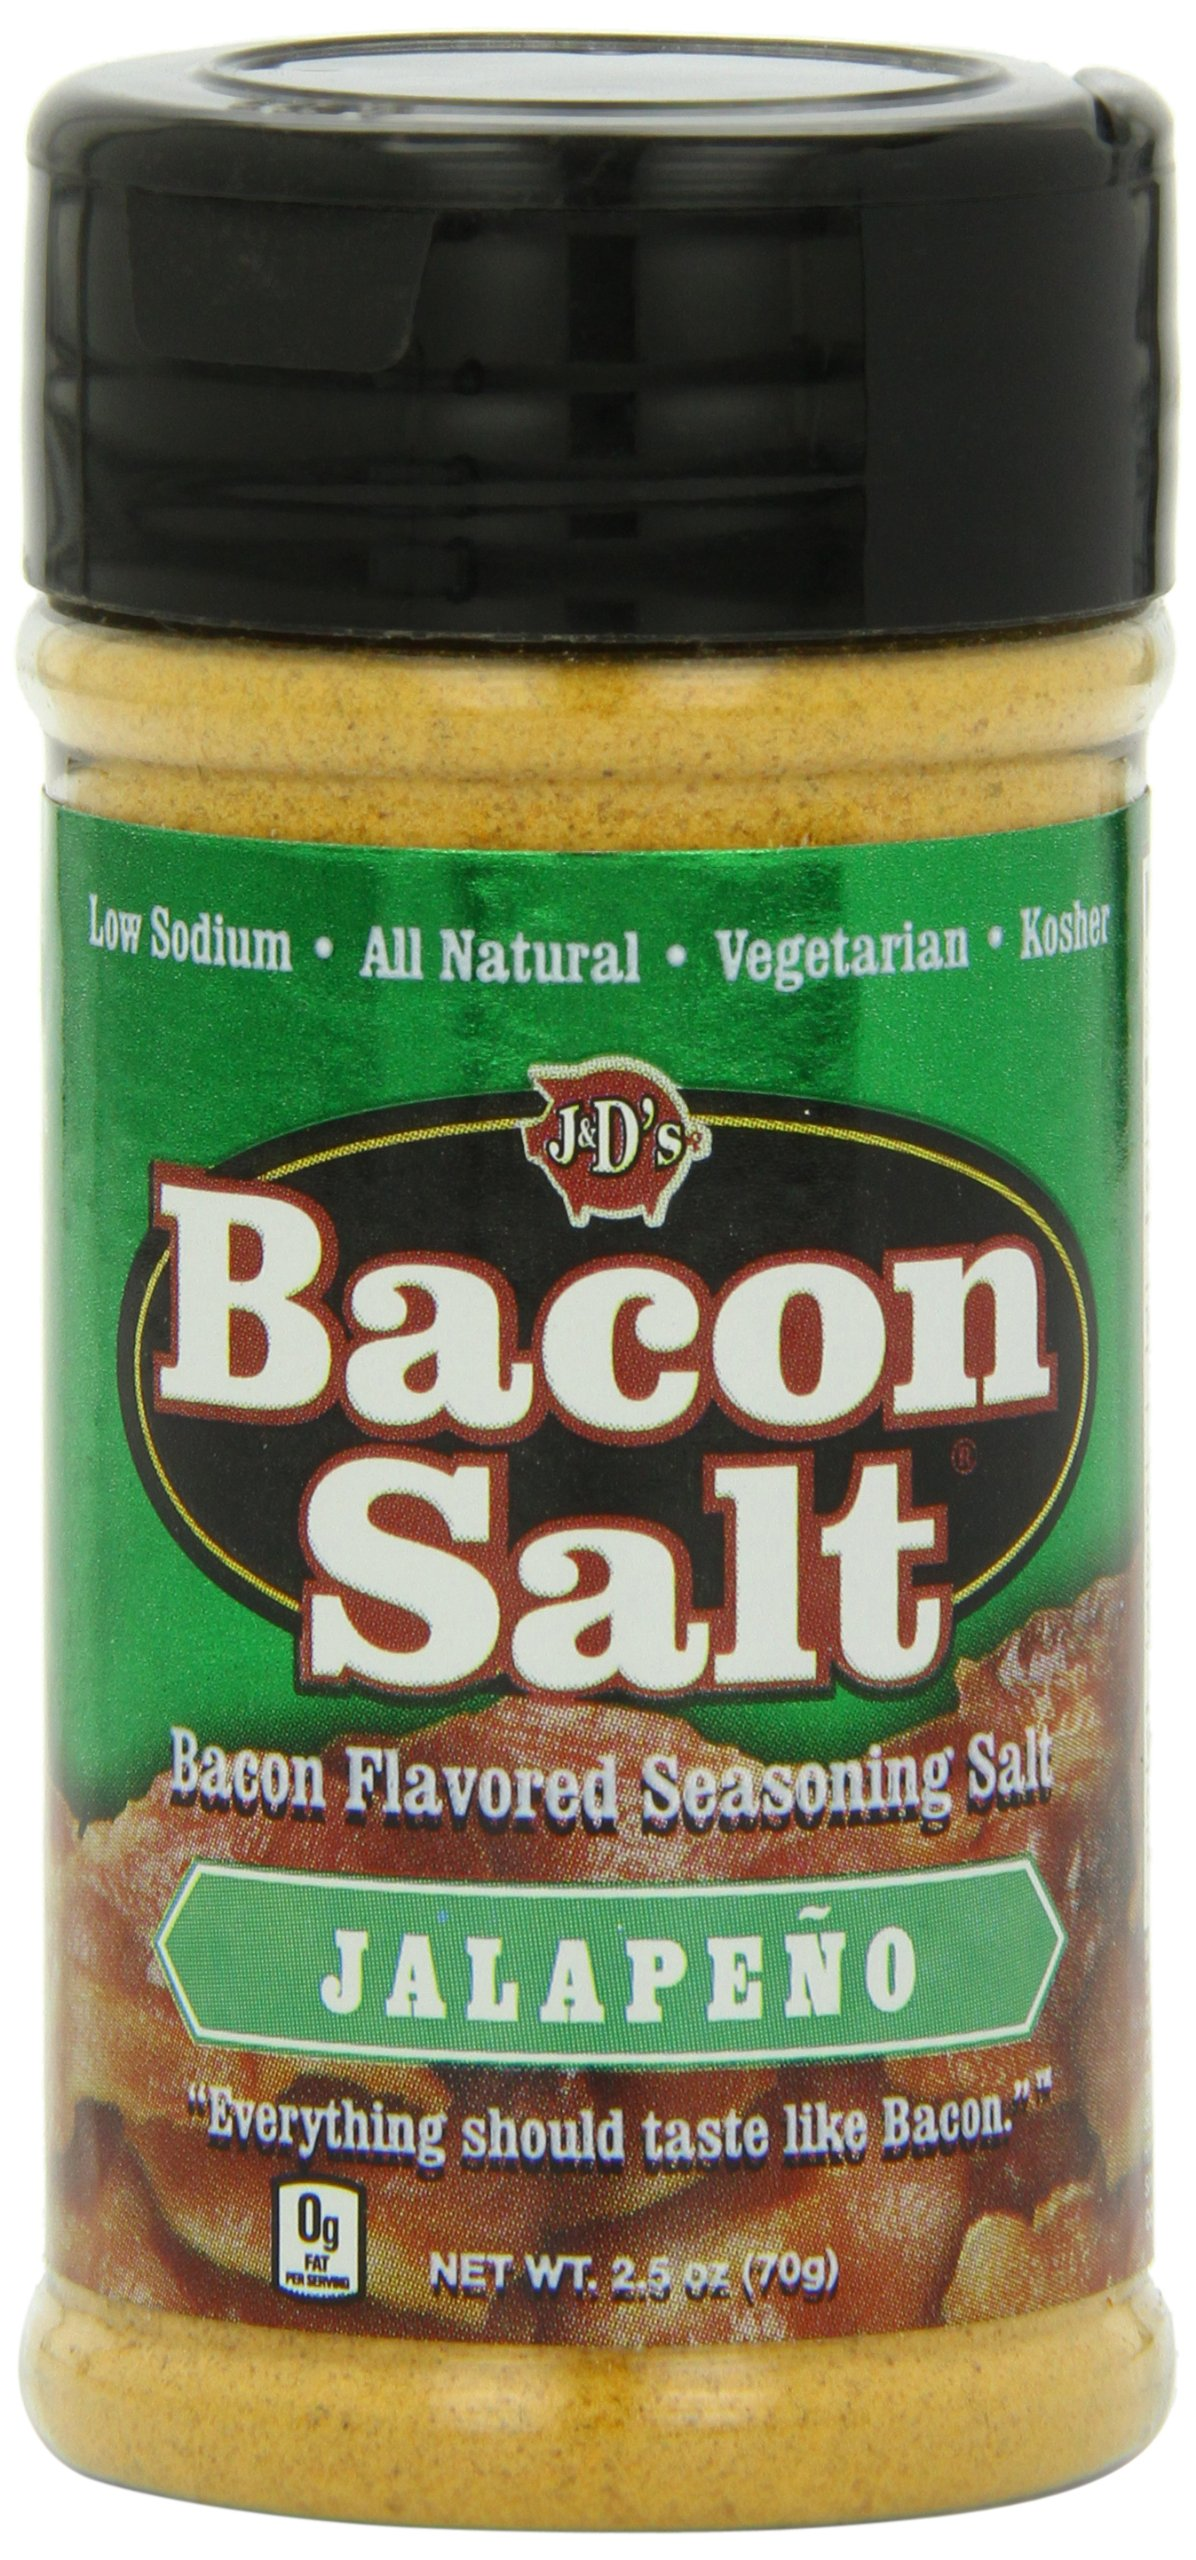 J&D's Bacon Salt, Jalapeno, 2.5 Ounce